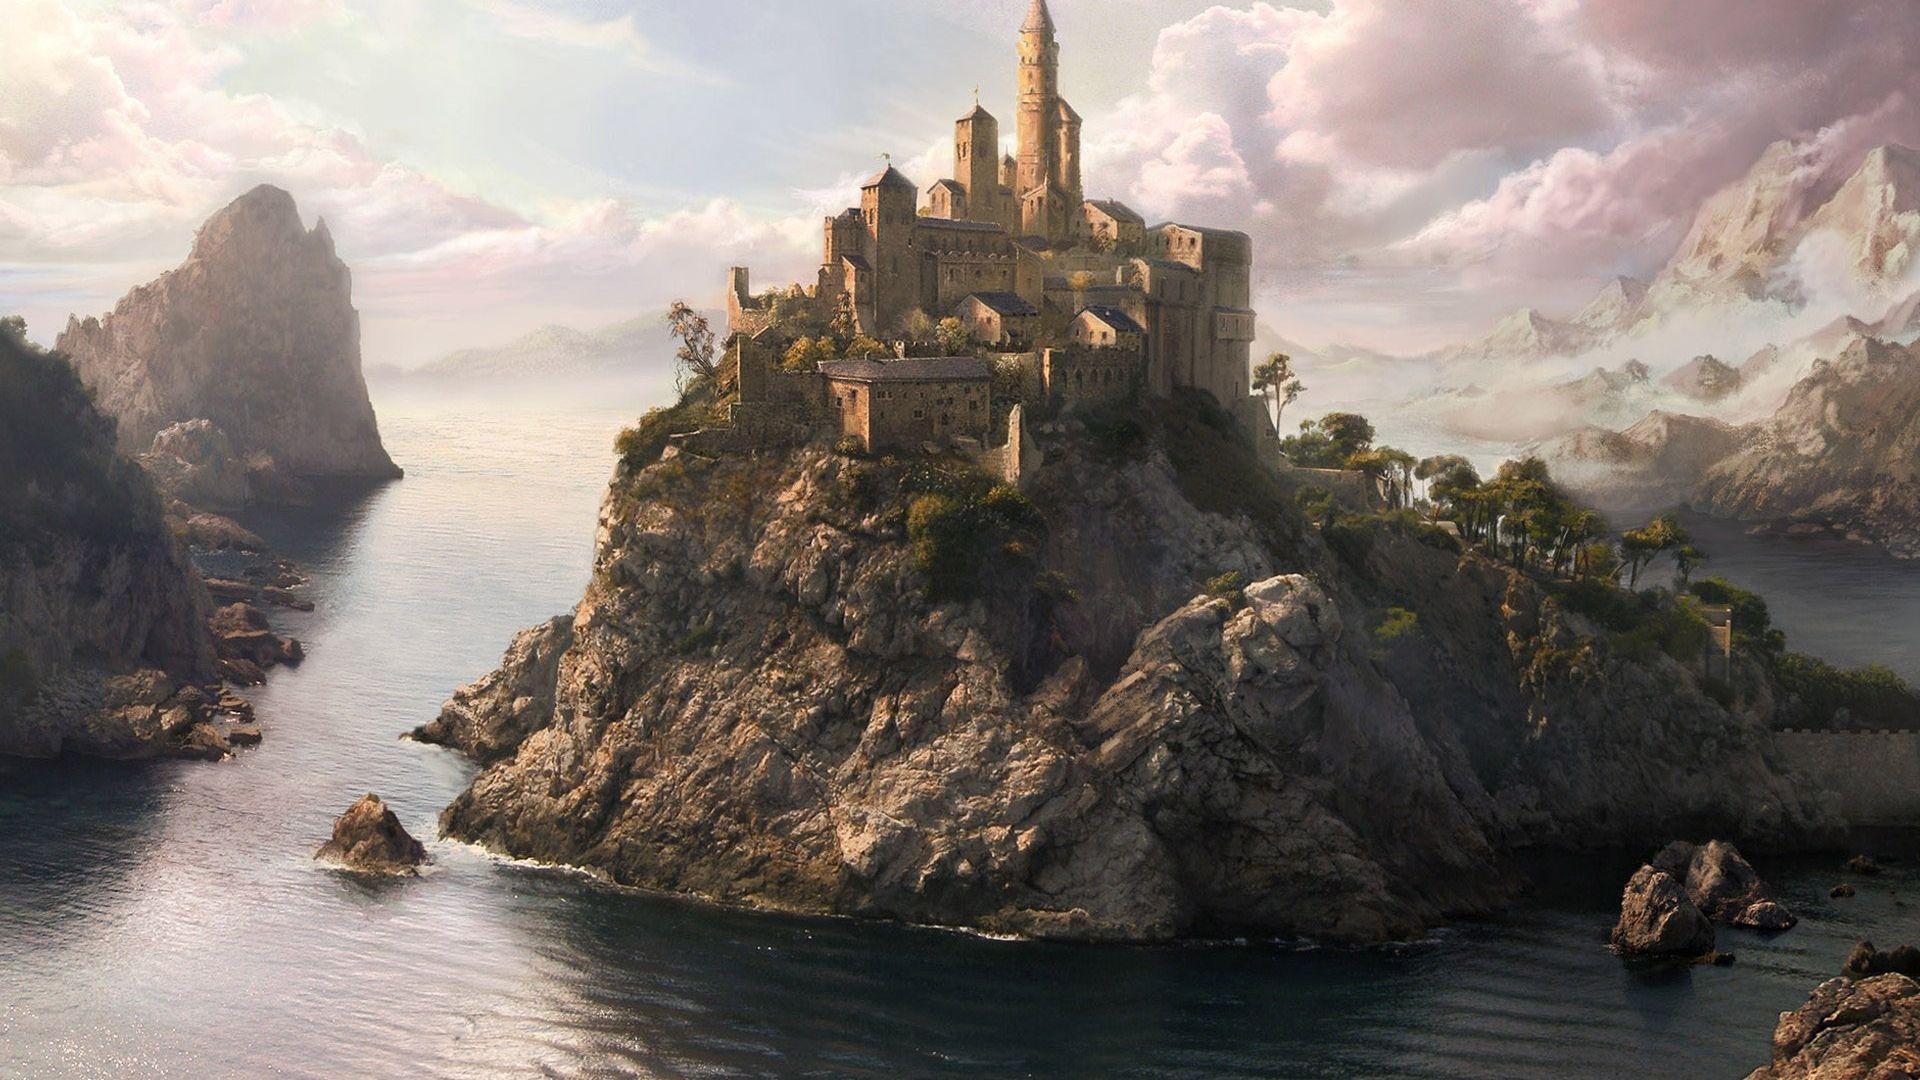 Fantasy River Mountains Castle Art Wallpaper